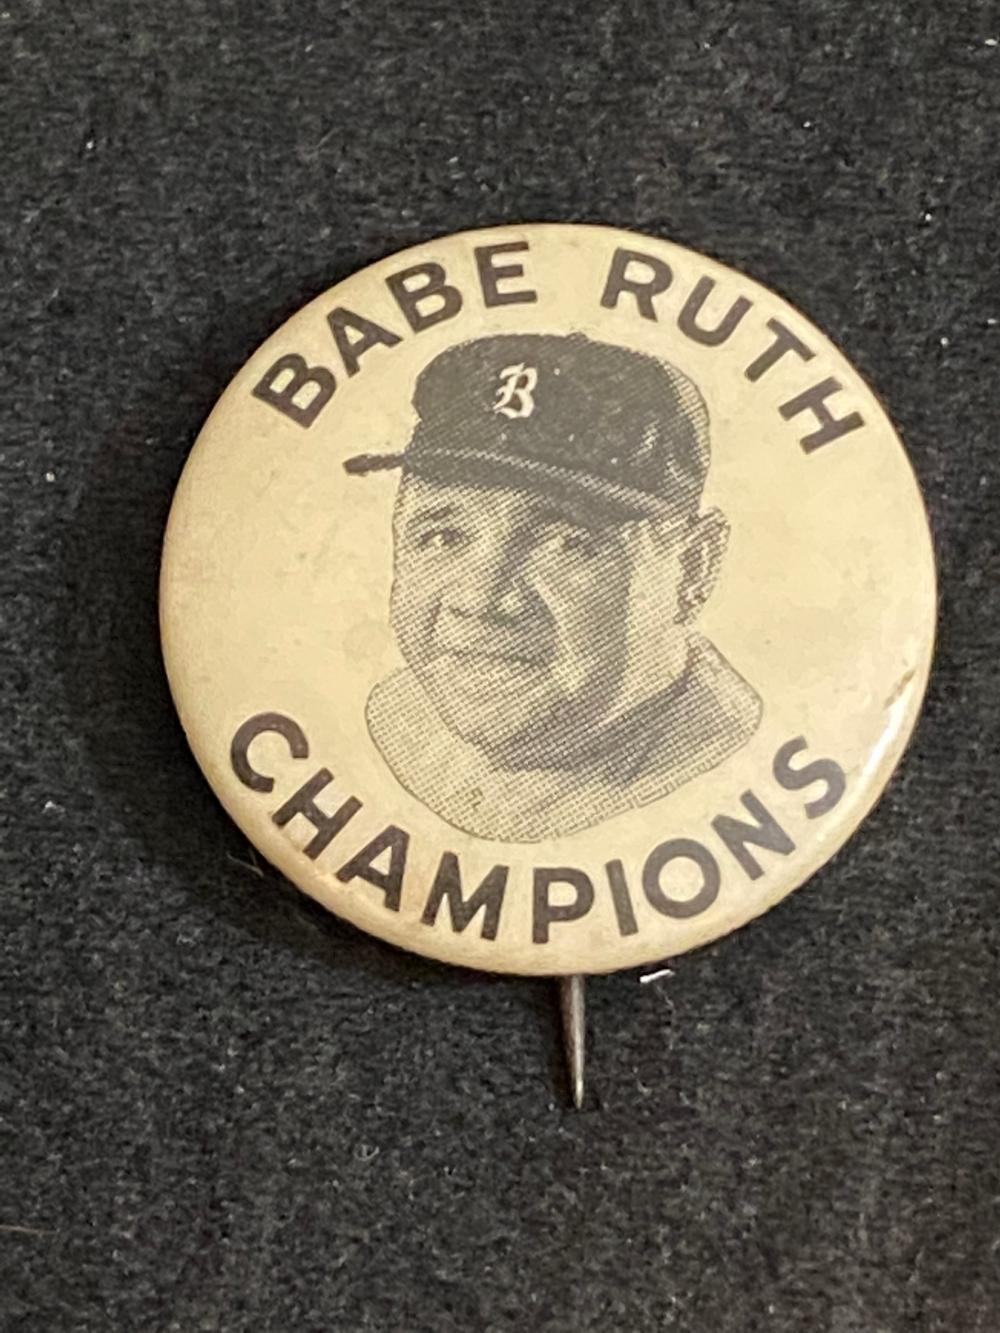 1935 Quaker Oats Babe Ruth Champions Pin